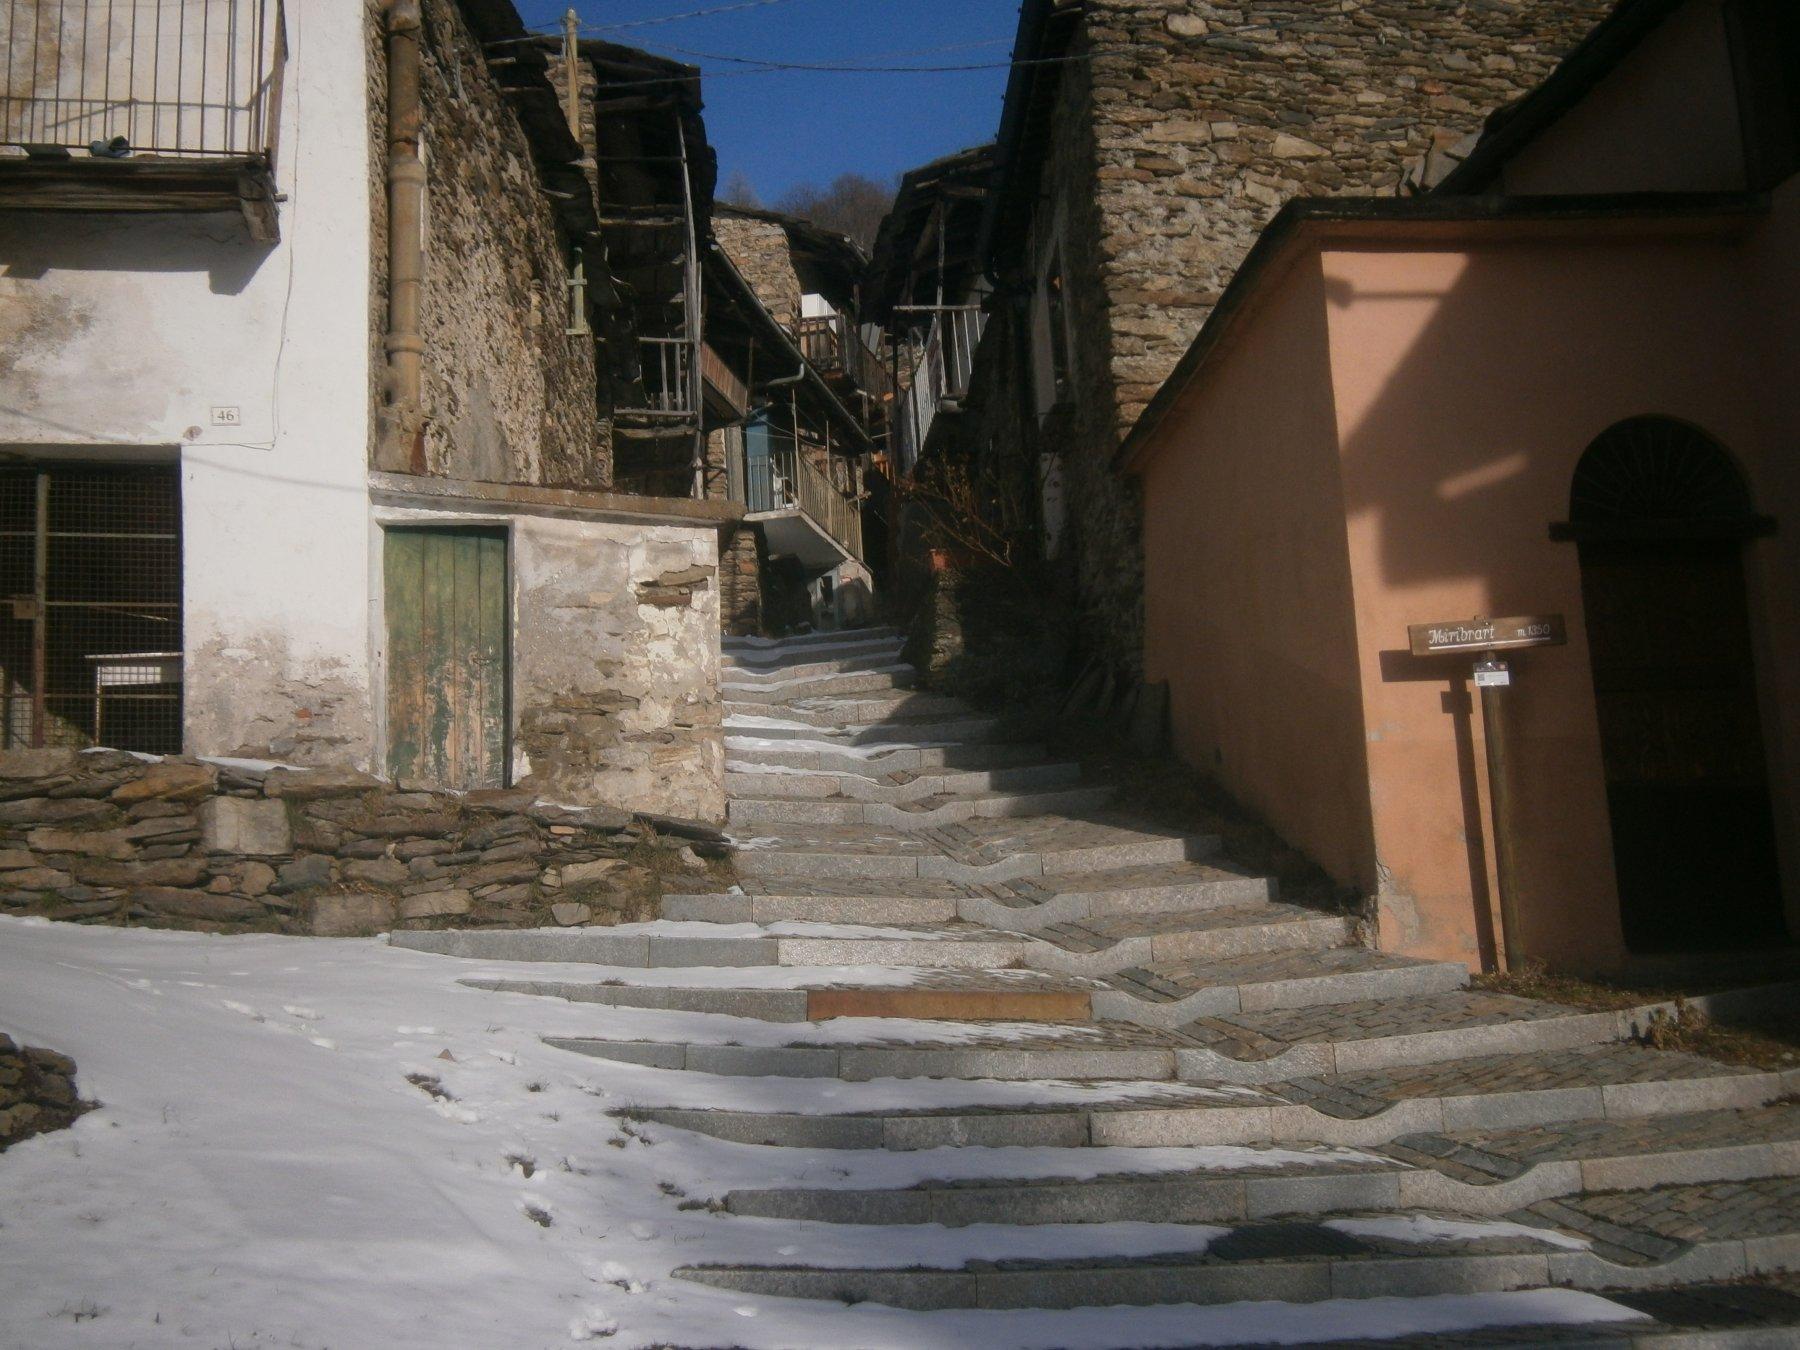 Sant'Antonio - Miribrart